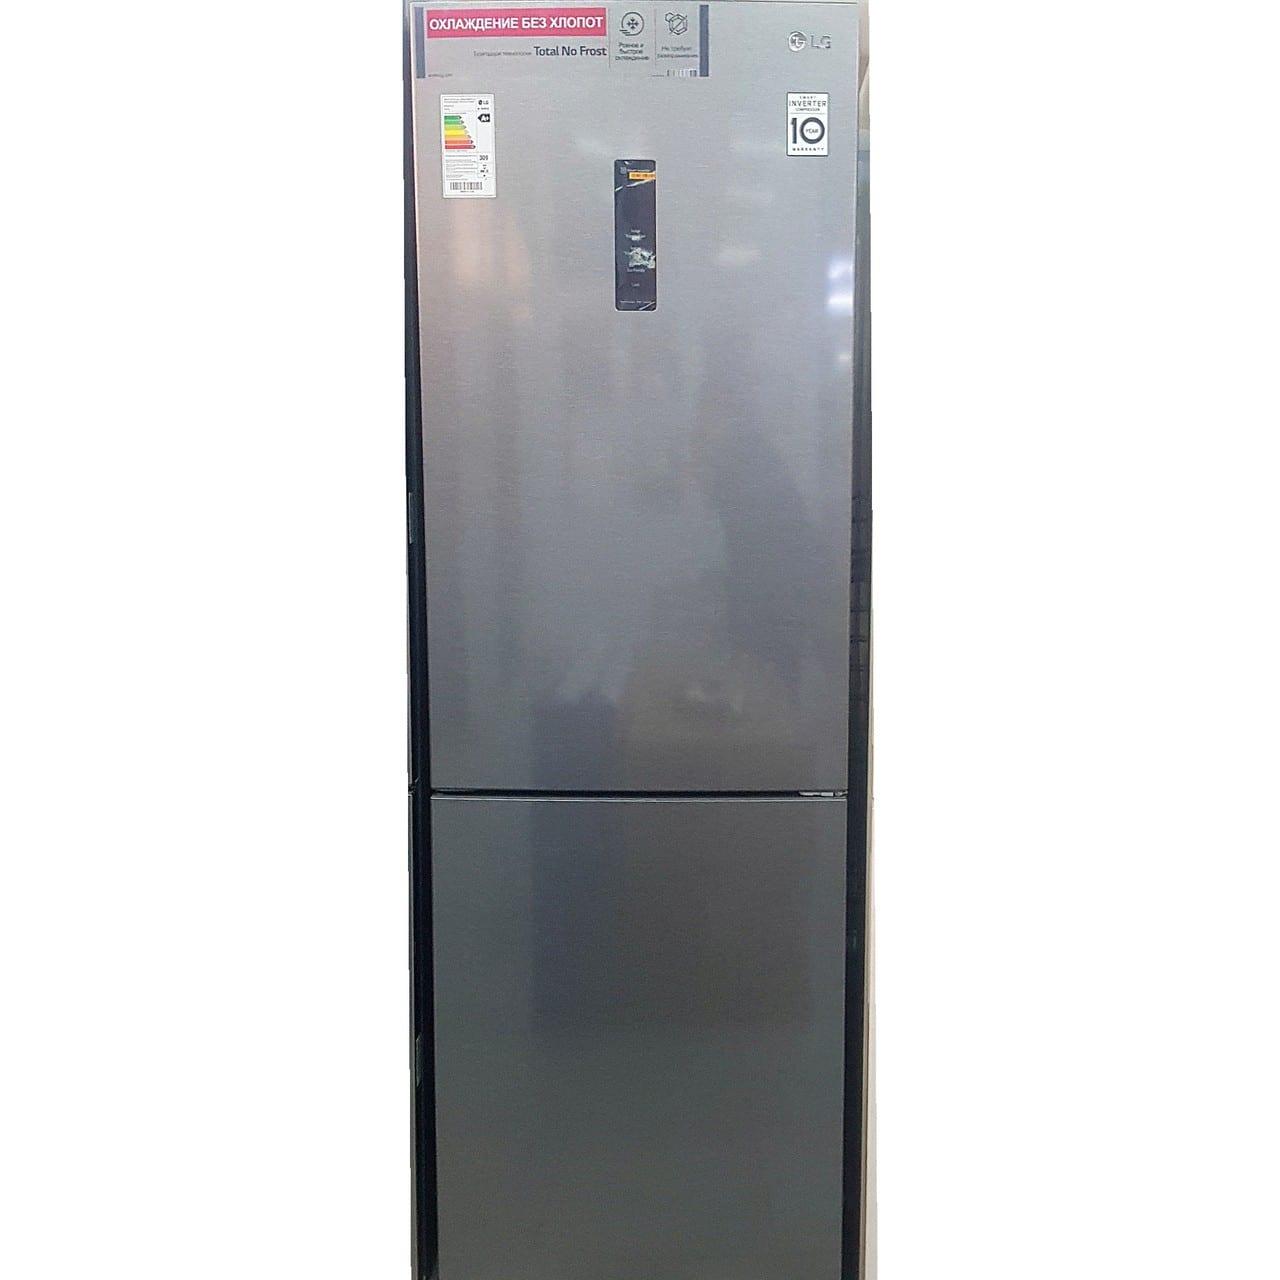 Холодильник двухкамерный LG 341 литр серый